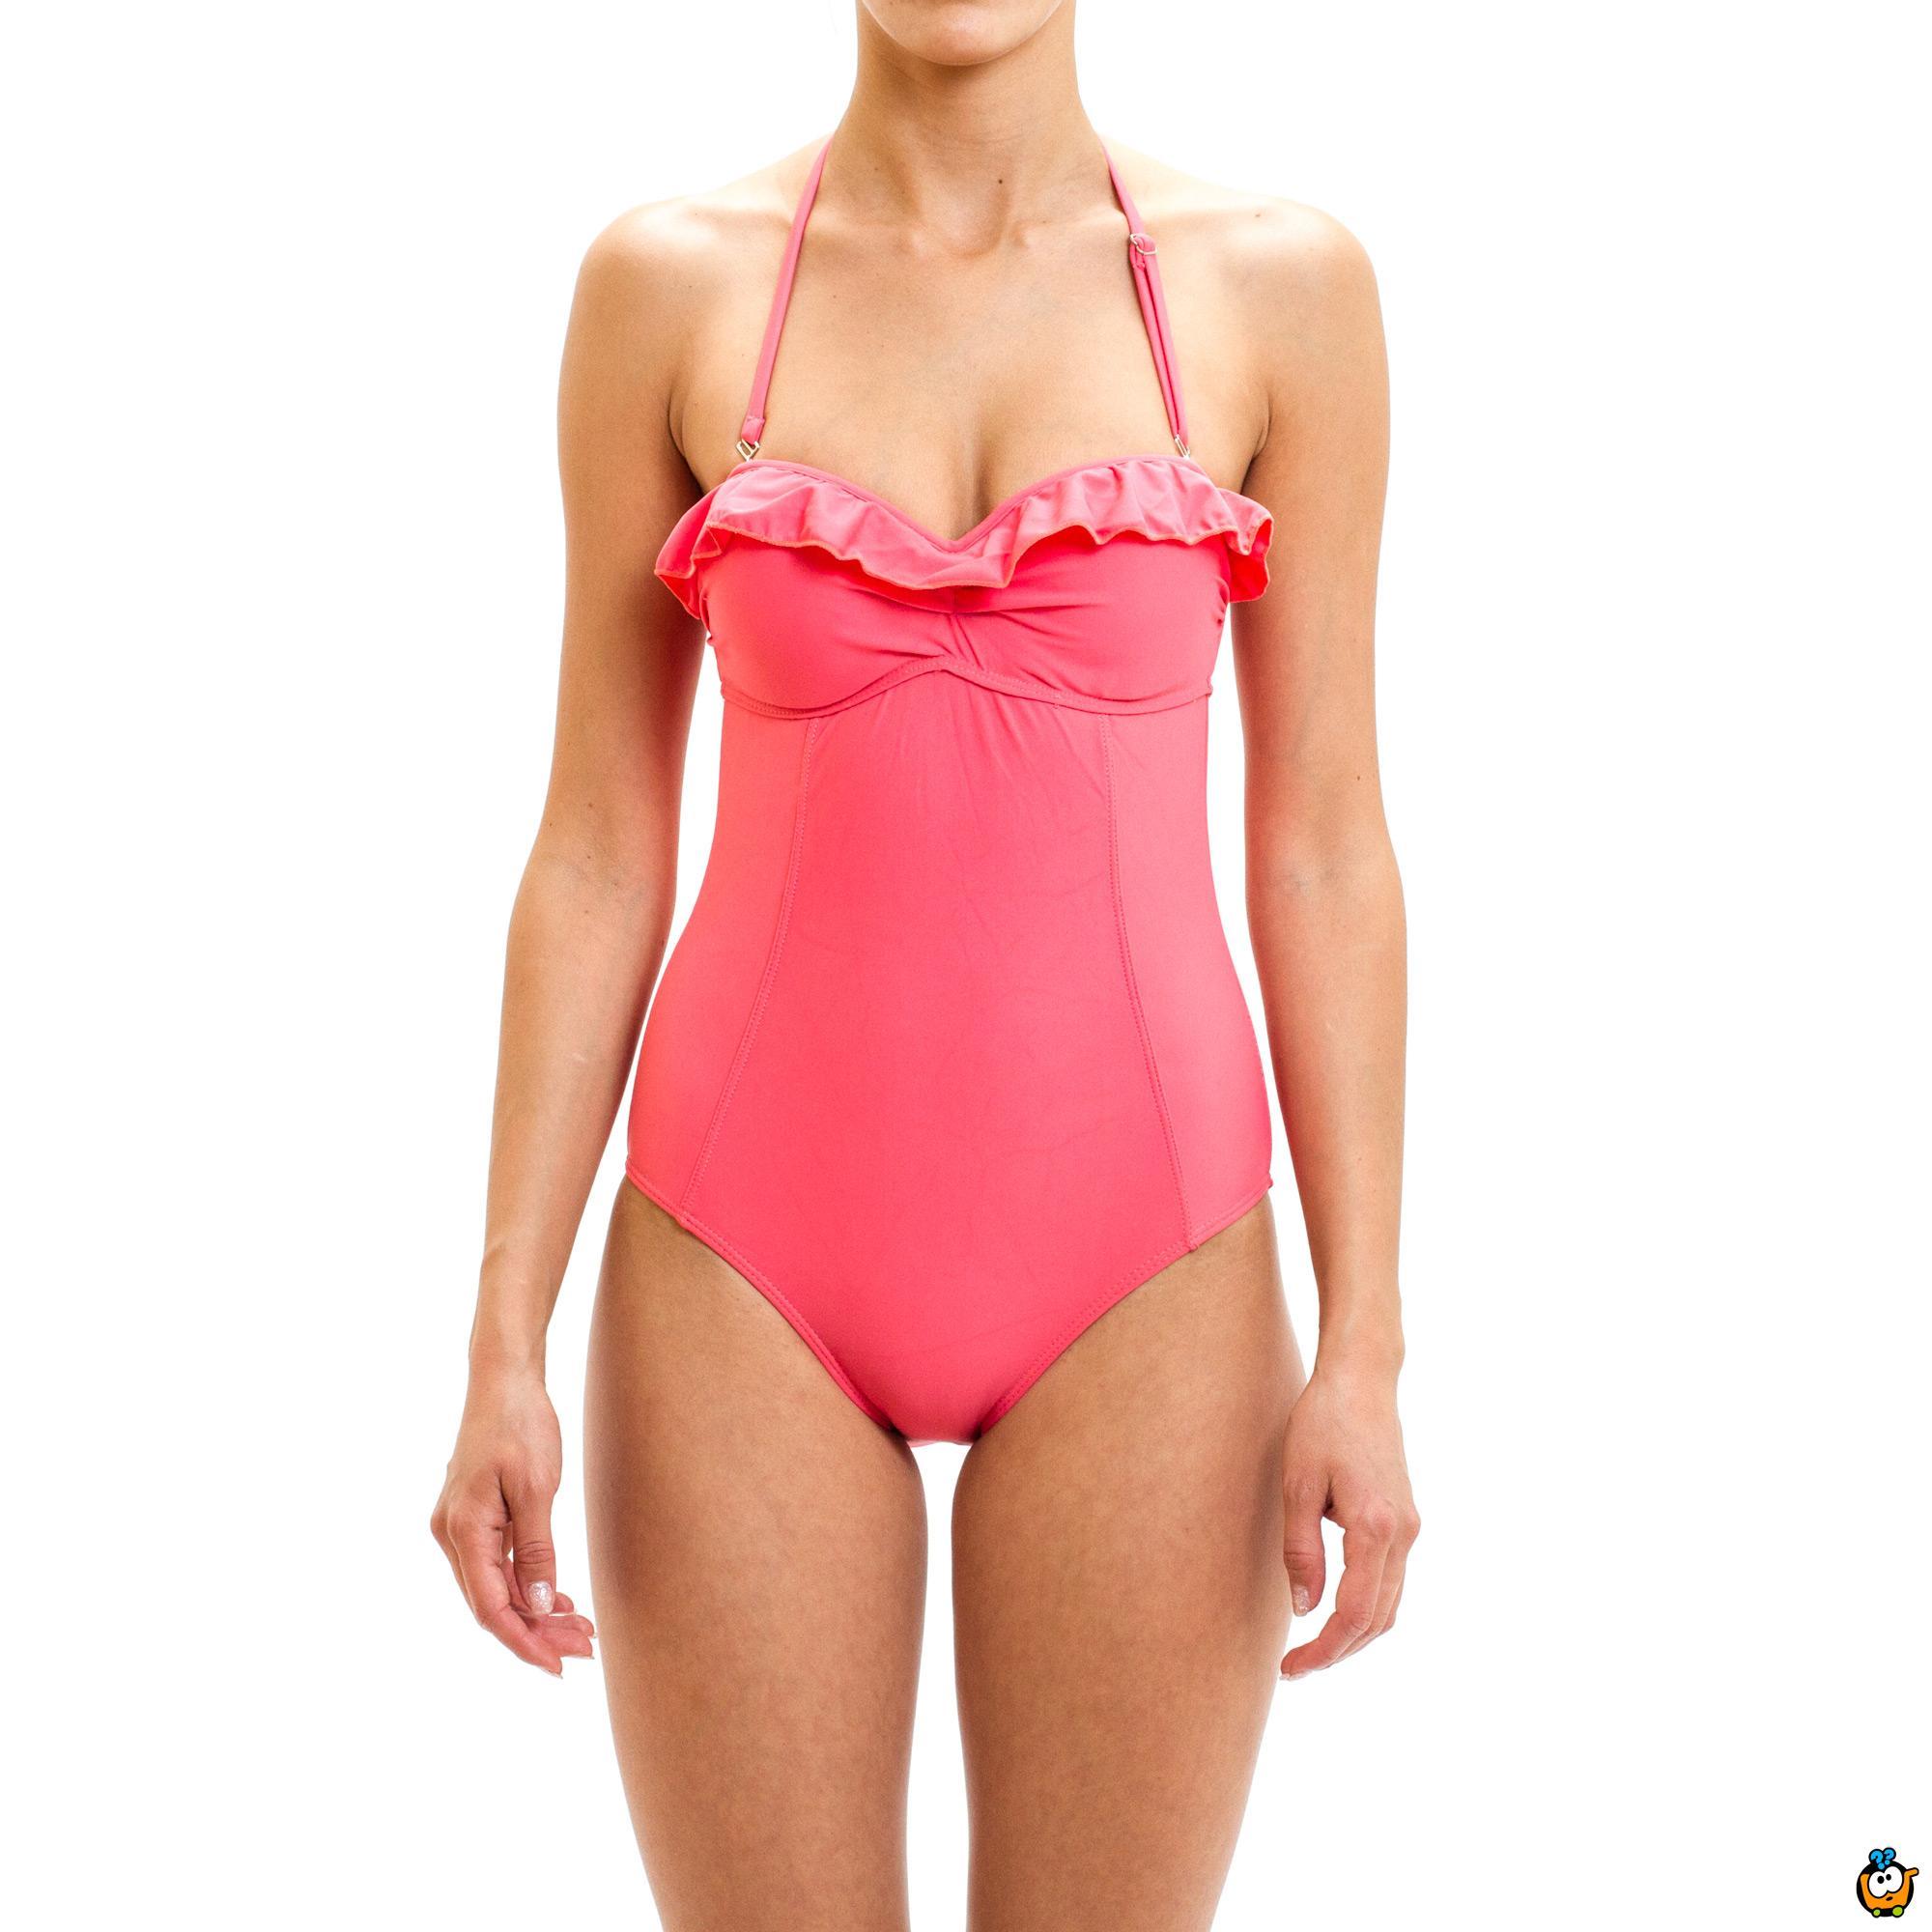 Jednodelni ženski kupaći kostim - MERMAID POWDER